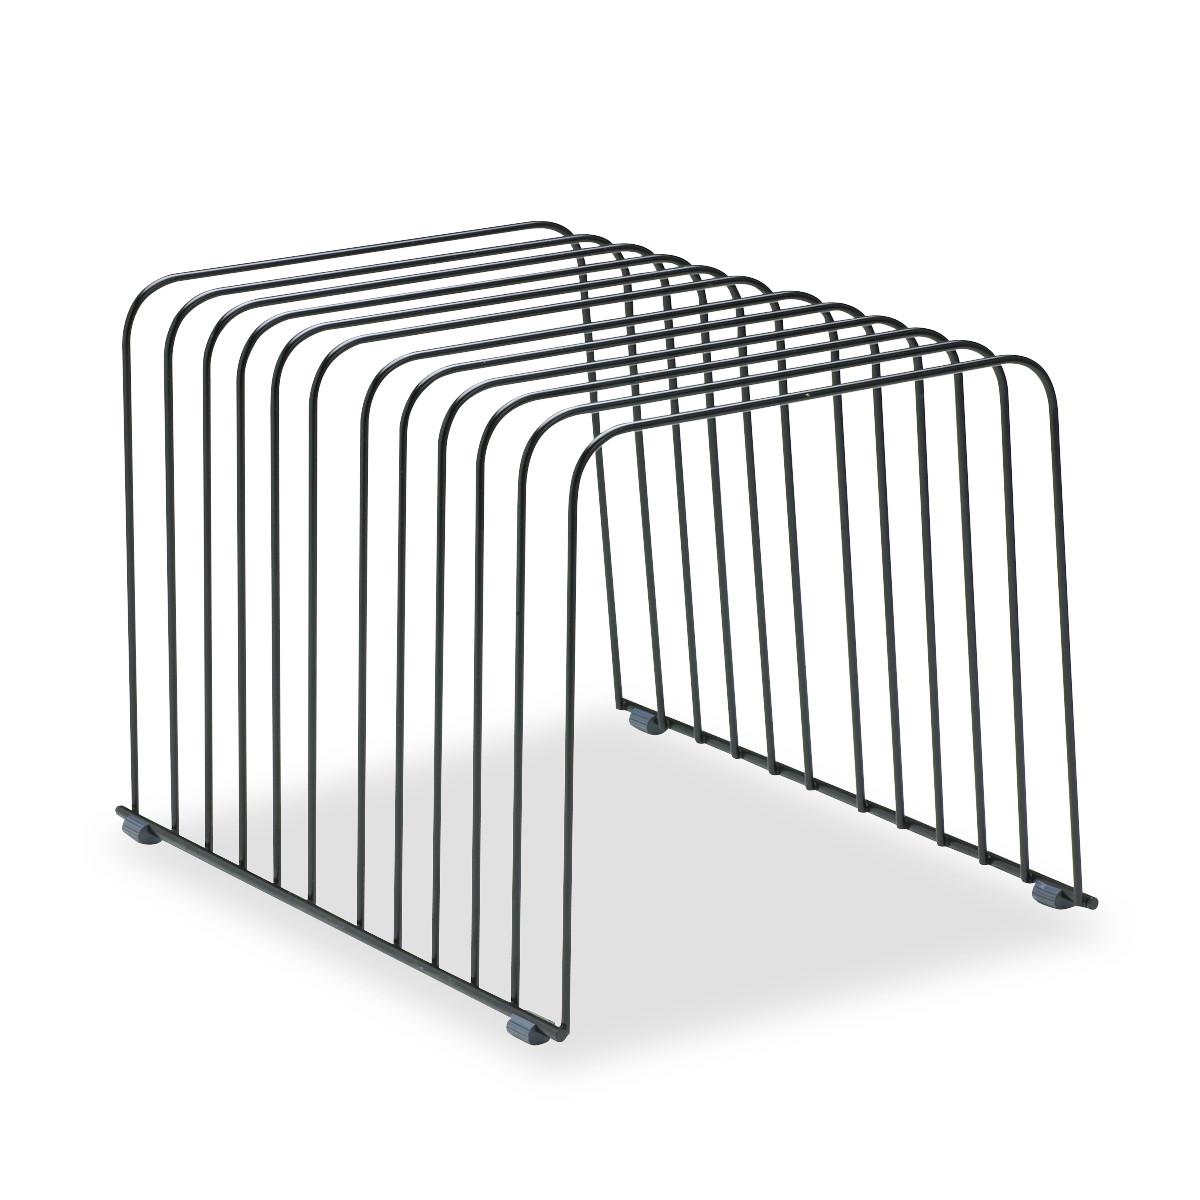 Fellowes Wire Desktop Organizer, 11 Comp, Steel, 9 x 11 3/8 x 8, Black -FEL72112